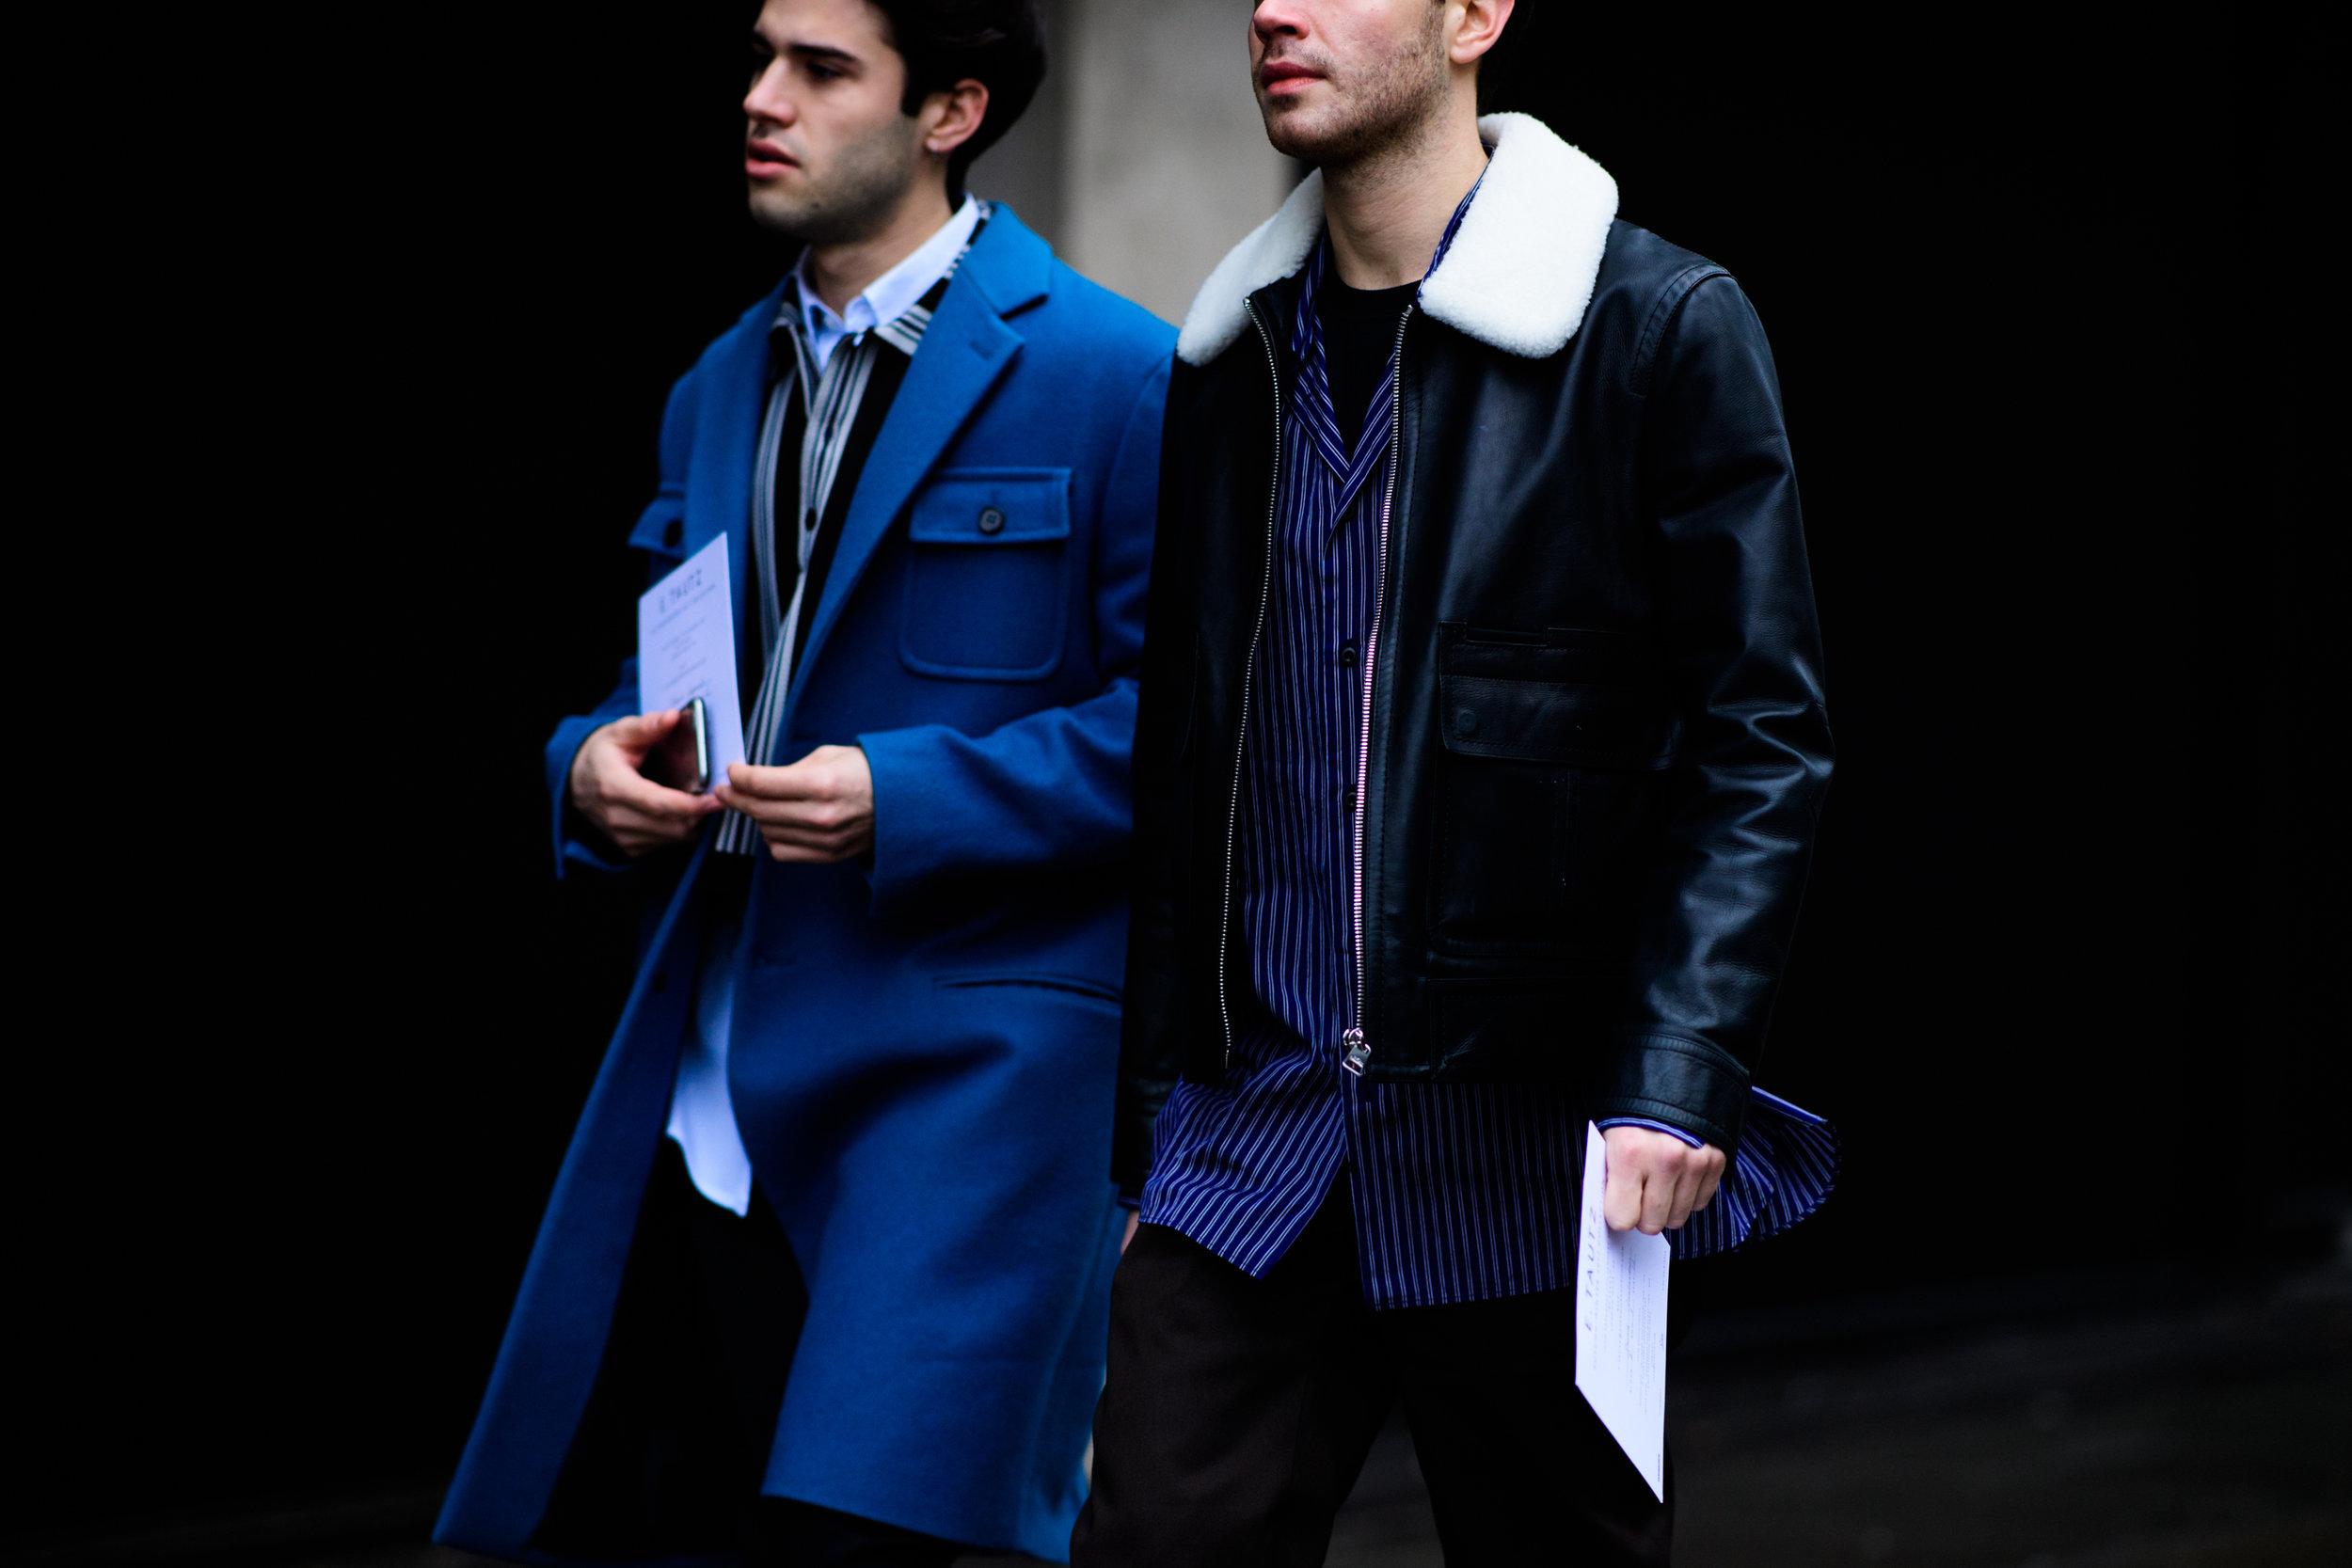 Le-21eme-Adam-Katz-Sinding-Thibaud-Guyonnet-Devid-Gualandris-London-Fashion-Week-Mens-Fall-Winter-2017-2018_AKS2206.jpg